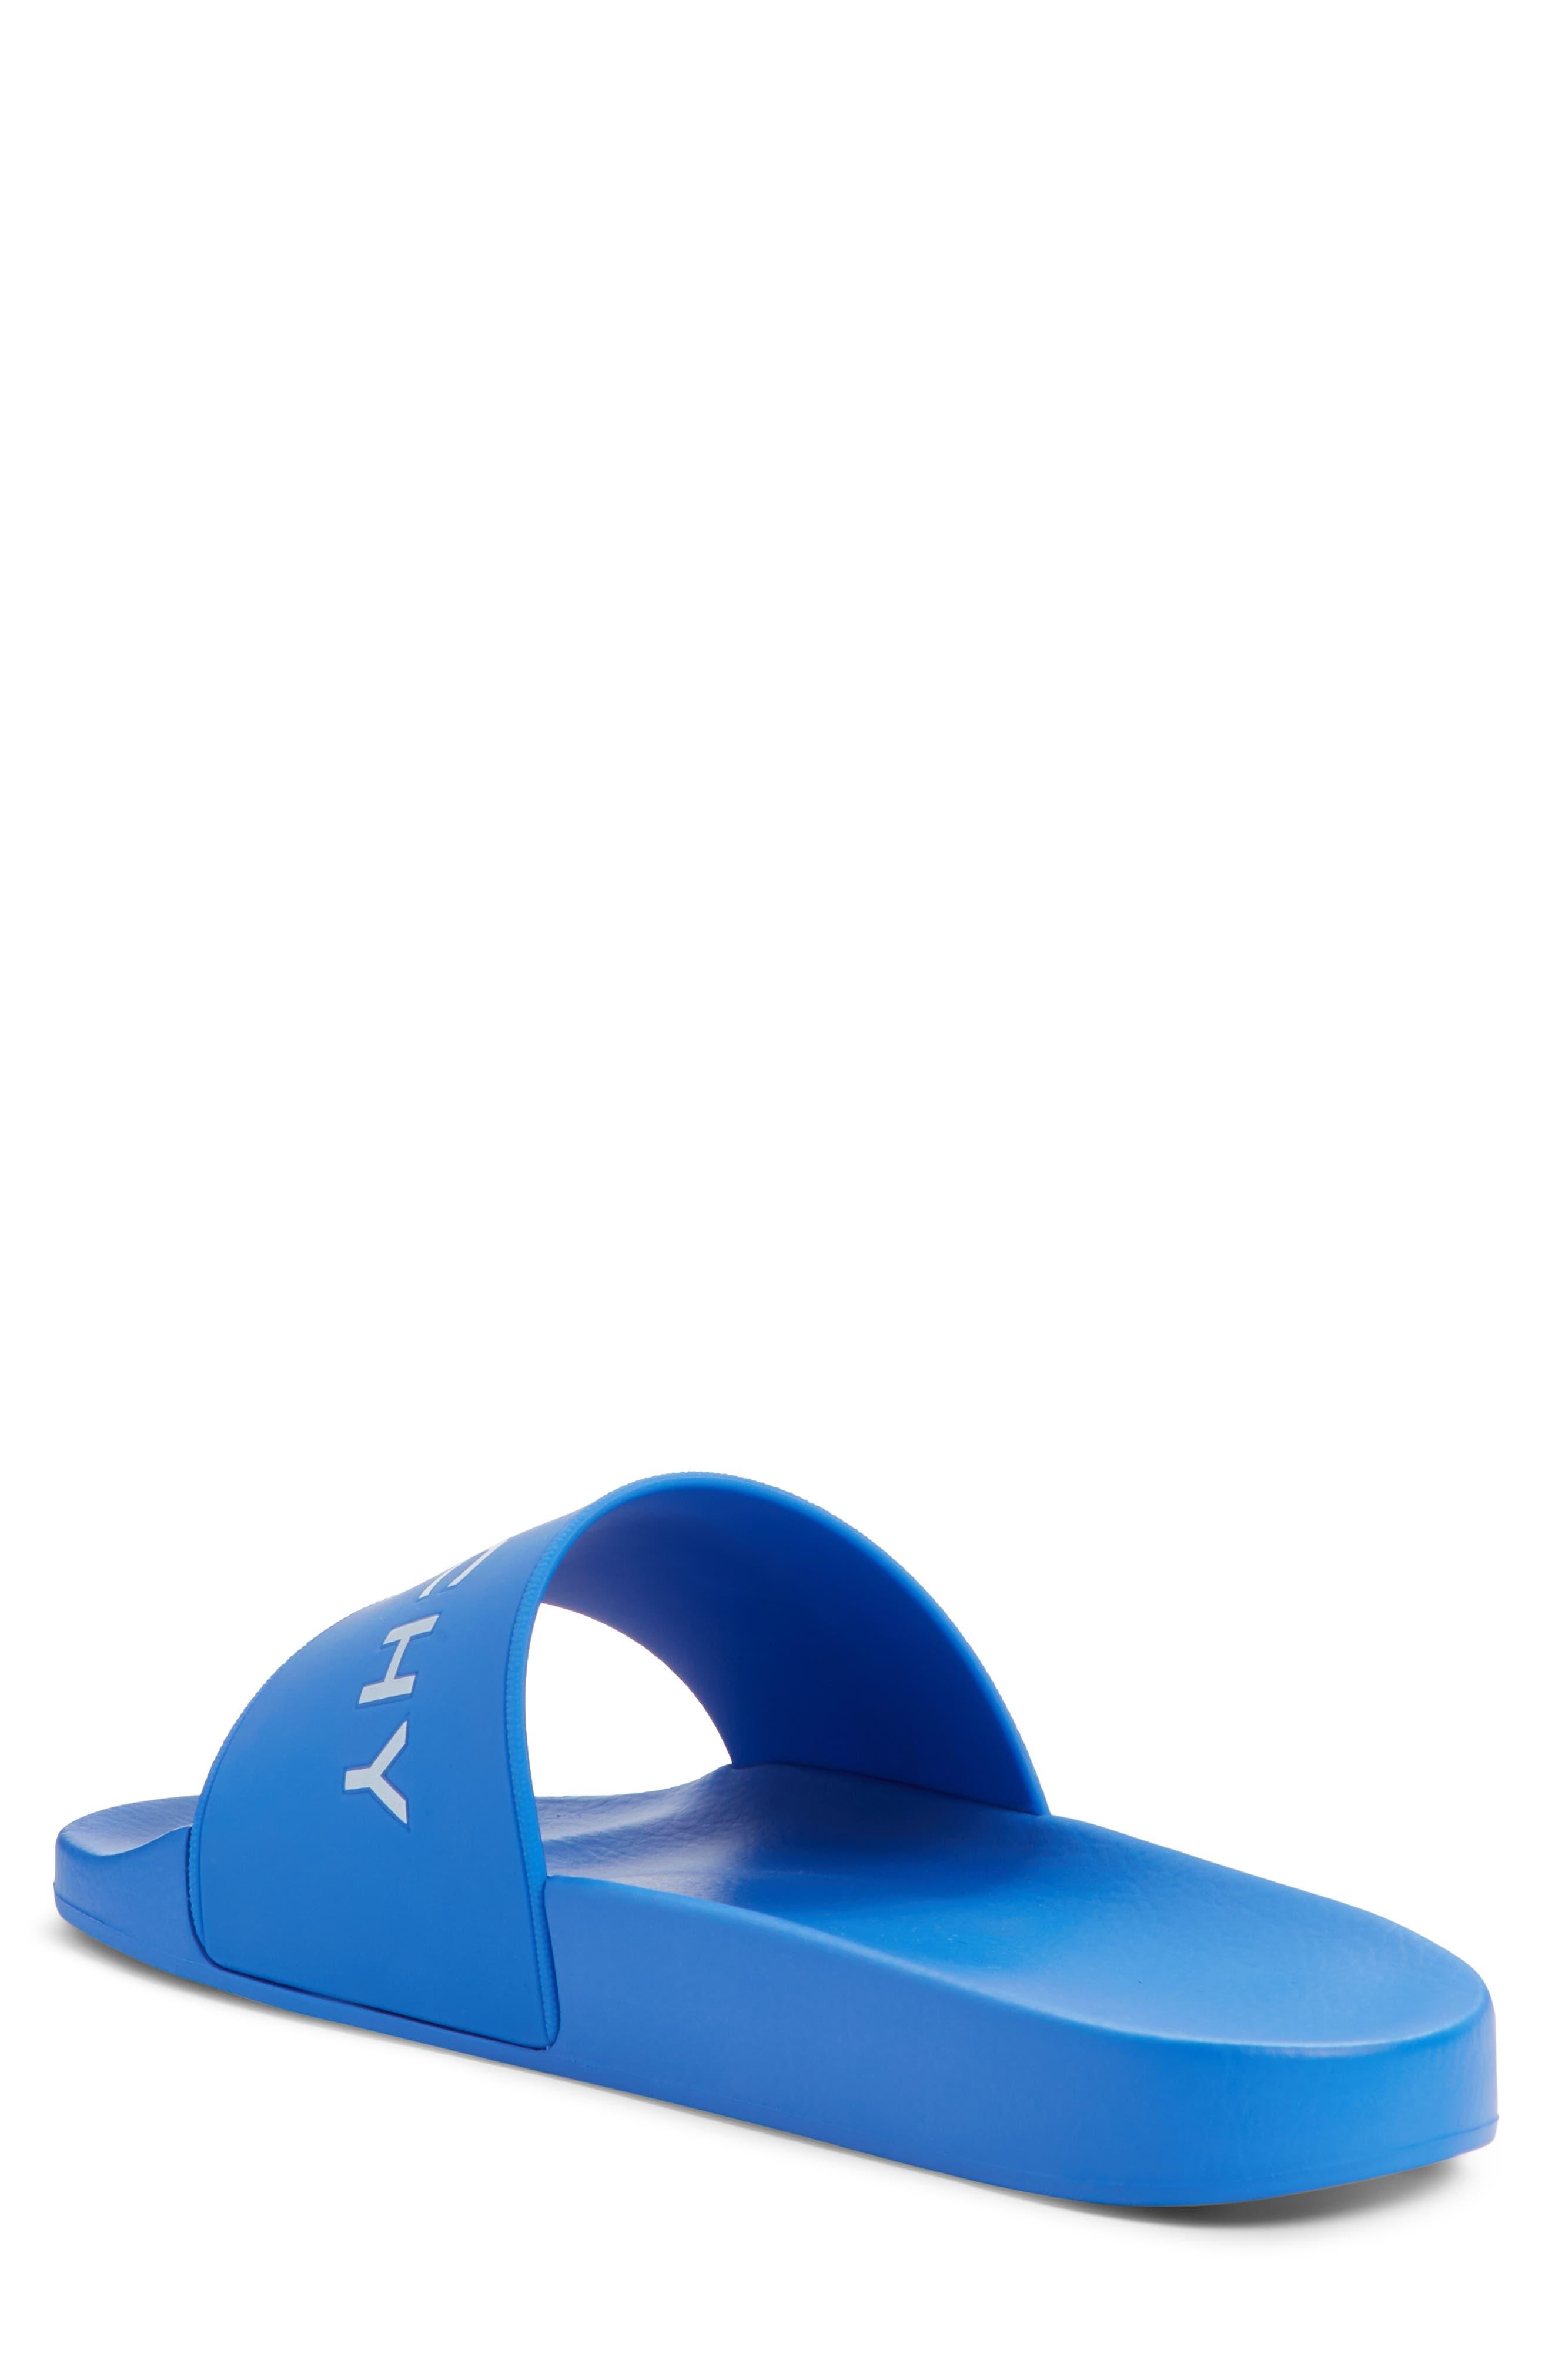 Slide Sandal,                             Alternate thumbnail 2, color,                             ELECTRIC BLUE/ WHITE